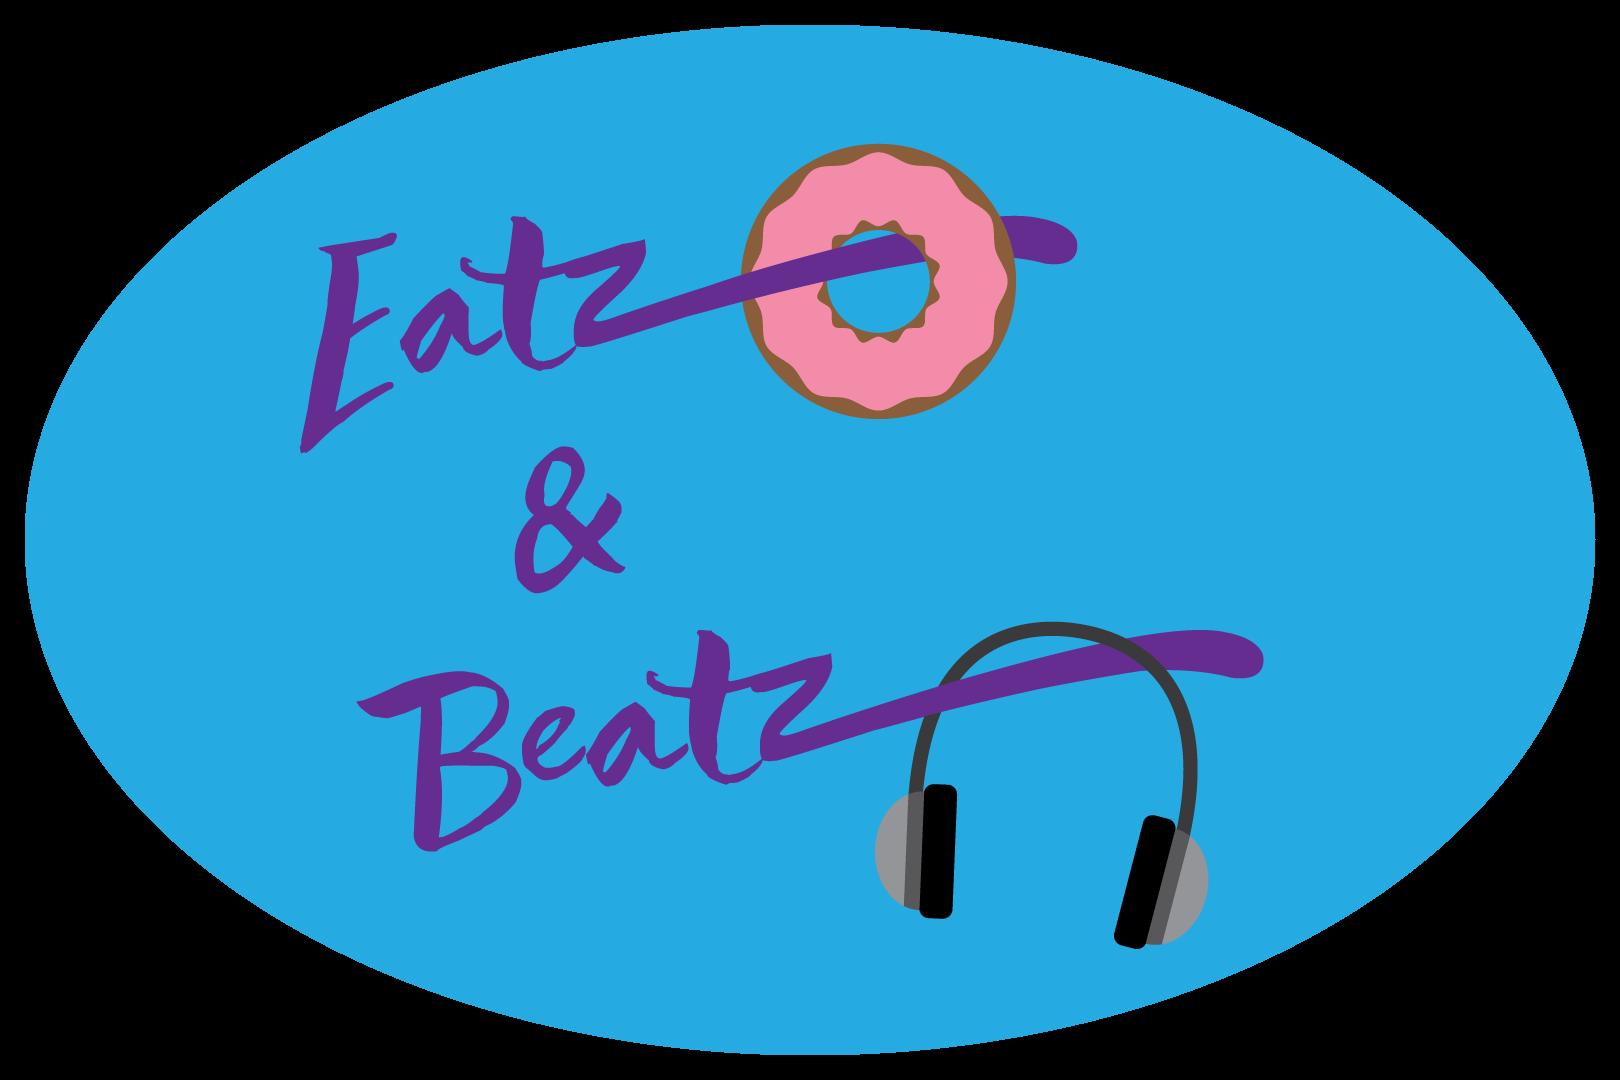 eatz-n-beatz_1620x1080.png